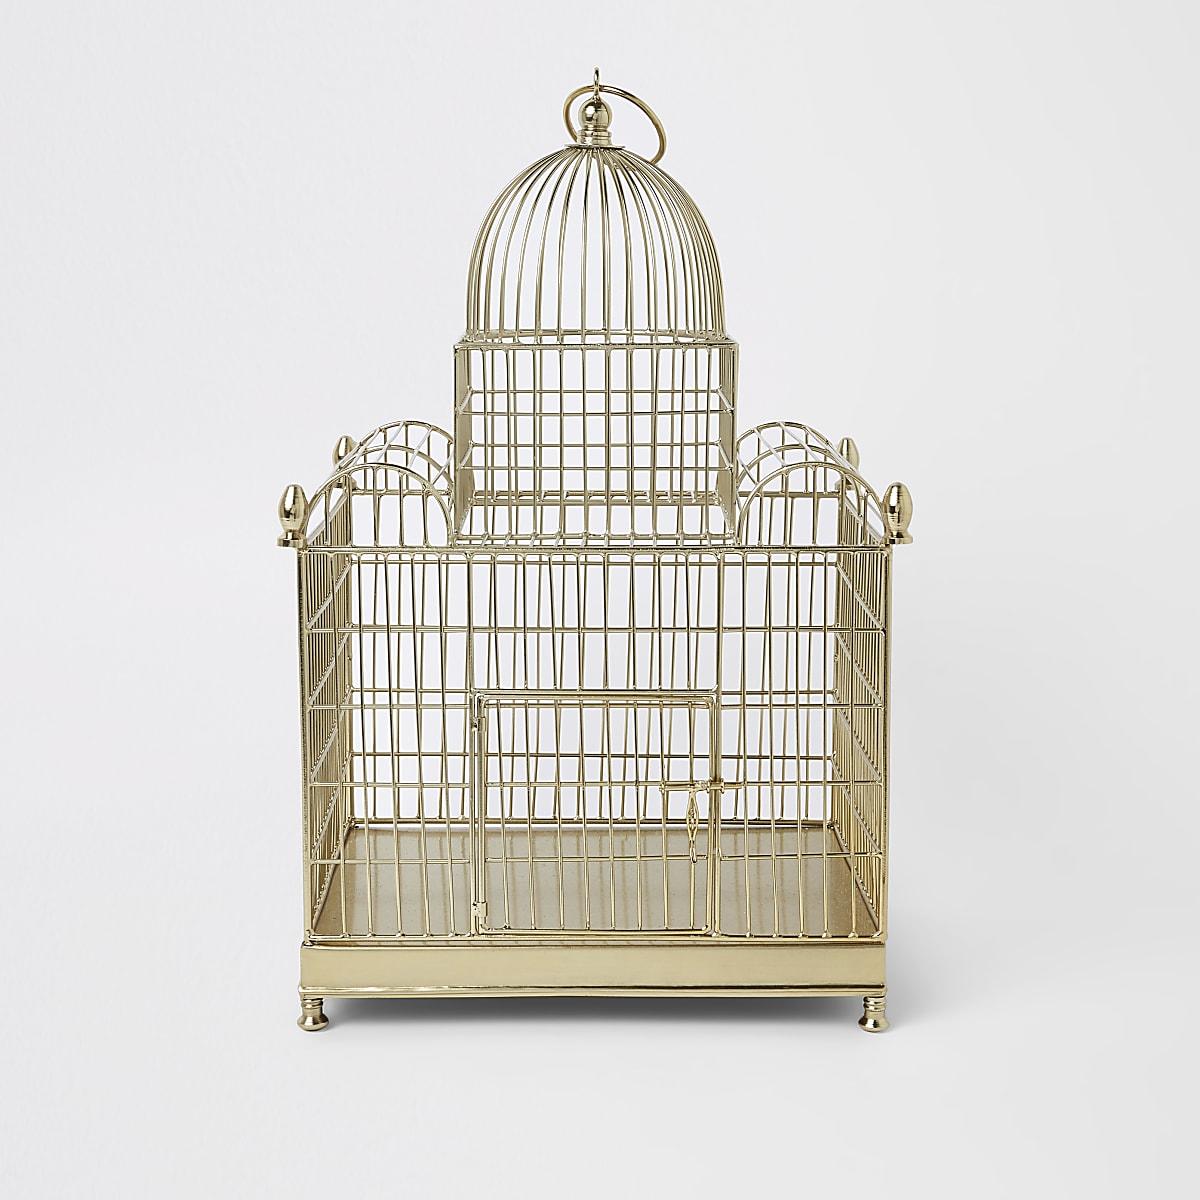 Decoratieve vogelkooi